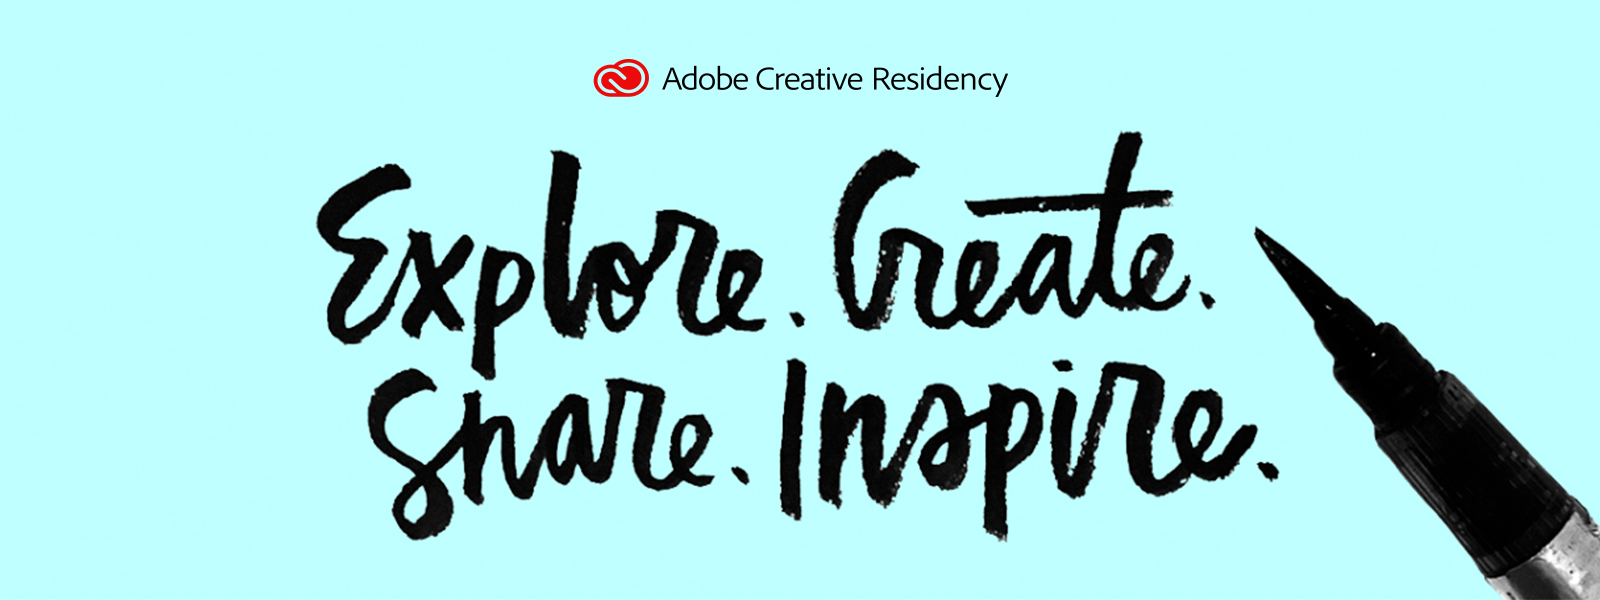 Add: Adobe Creative Residency